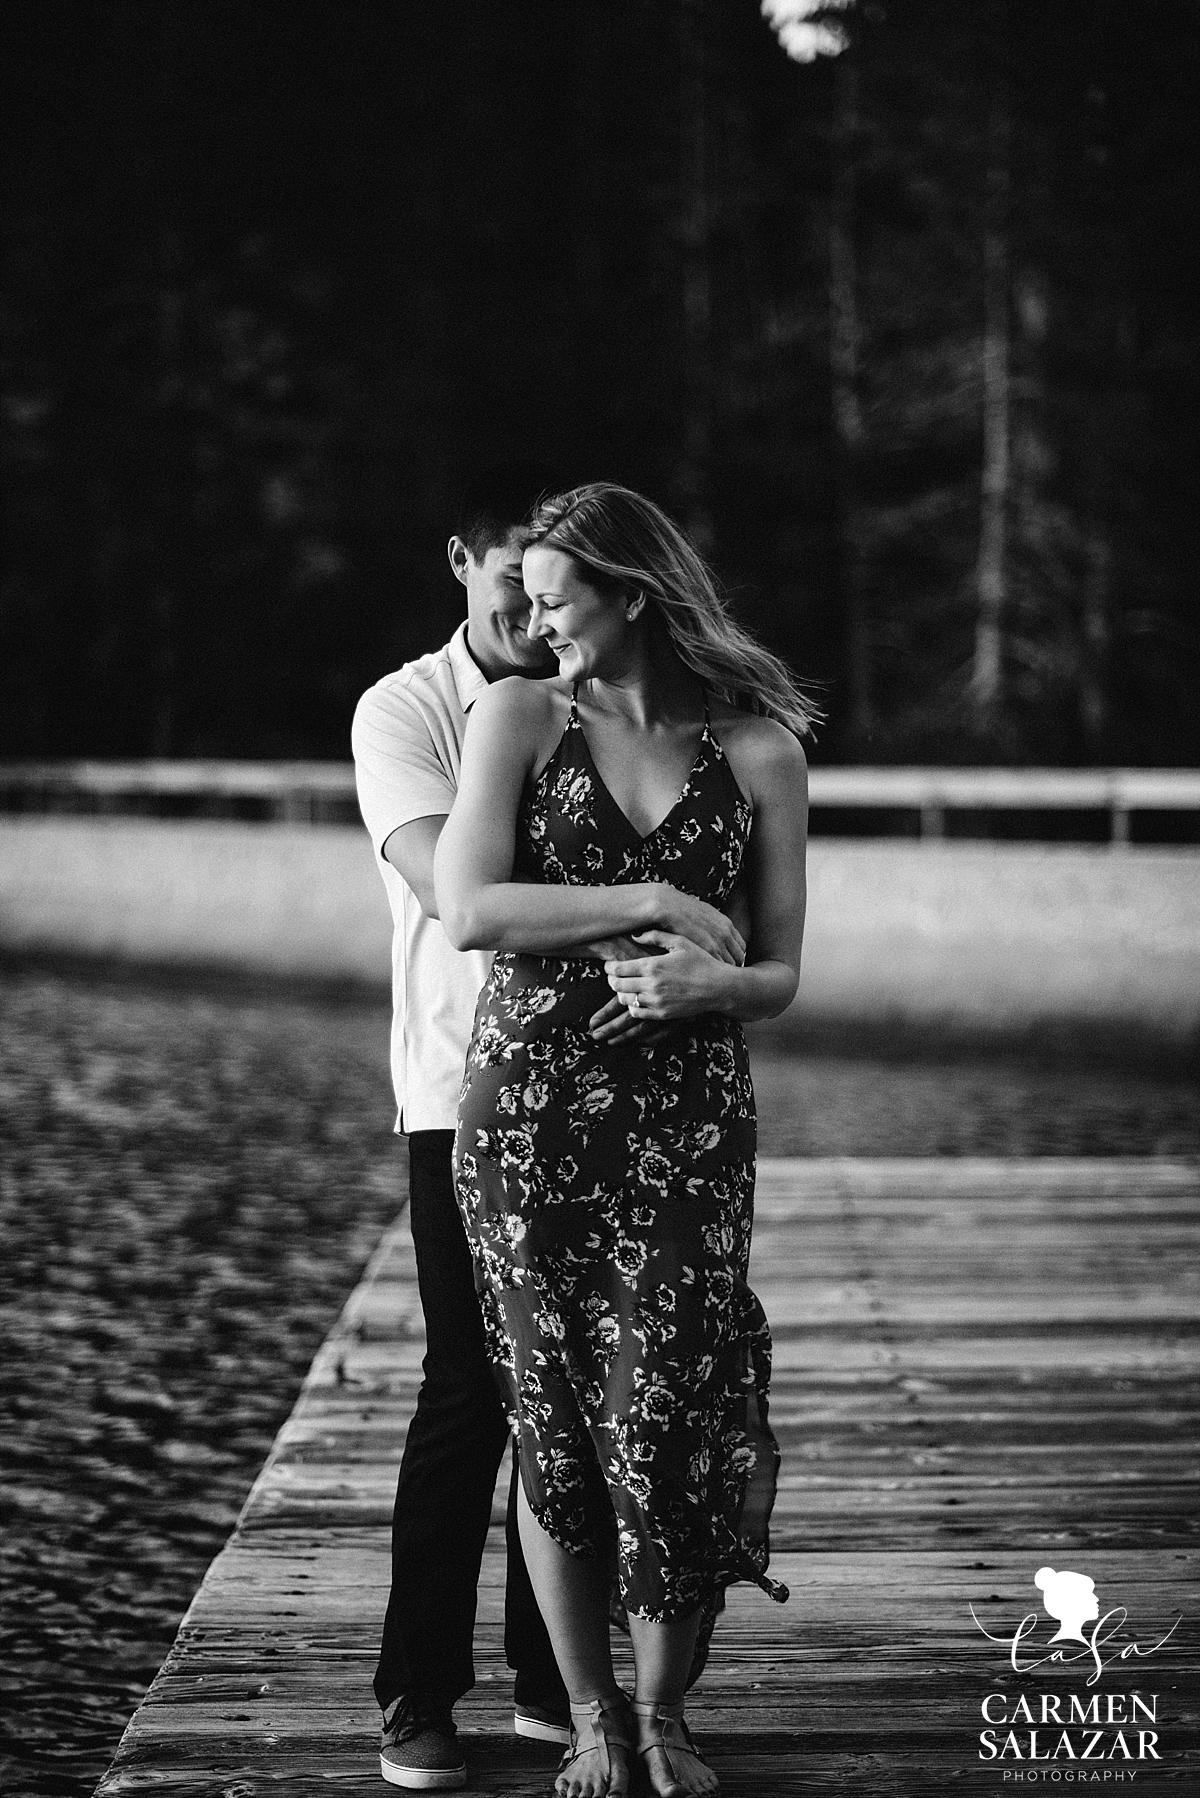 Sweetheart engagement photography adventures - Carmen Salazar